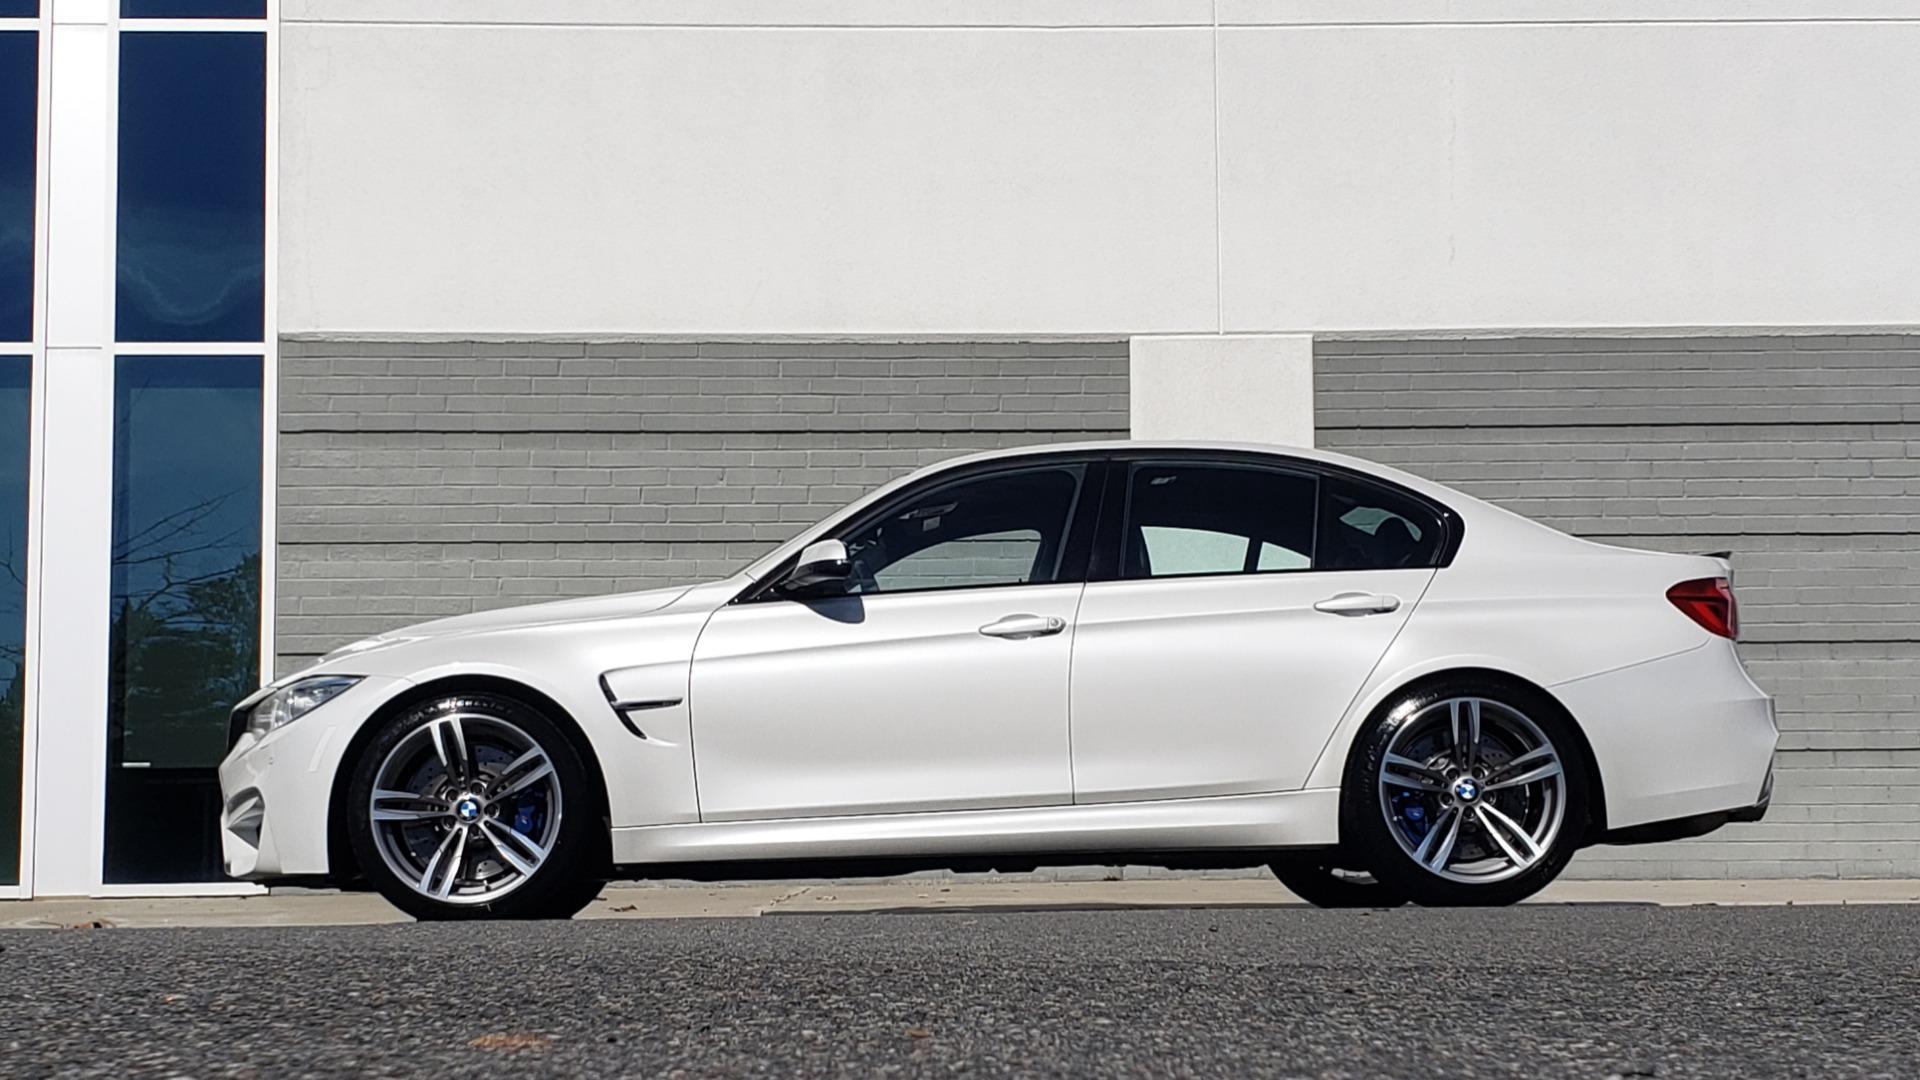 Used 2016 BMW M3 SEDAN / EXECUTIVE PKG / M-SUSPENSION / HARMAN/KARDON SOUND for sale Sold at Formula Imports in Charlotte NC 28227 6